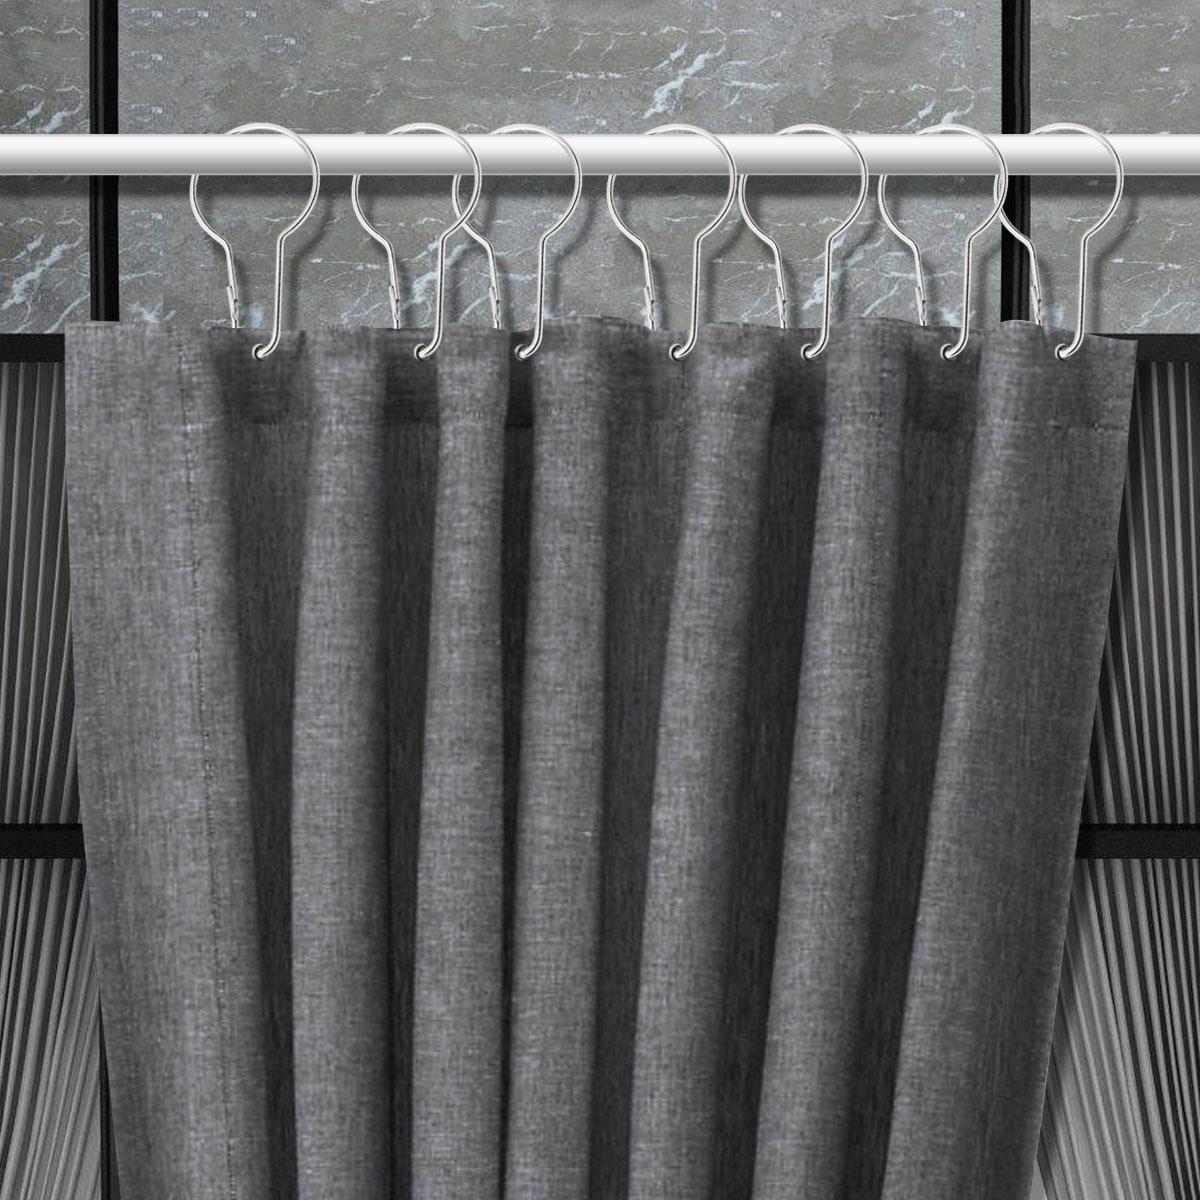 Window Curtain 8Pcs Melarosa Yellow High Quality Scarf Sheer shower Curtain set